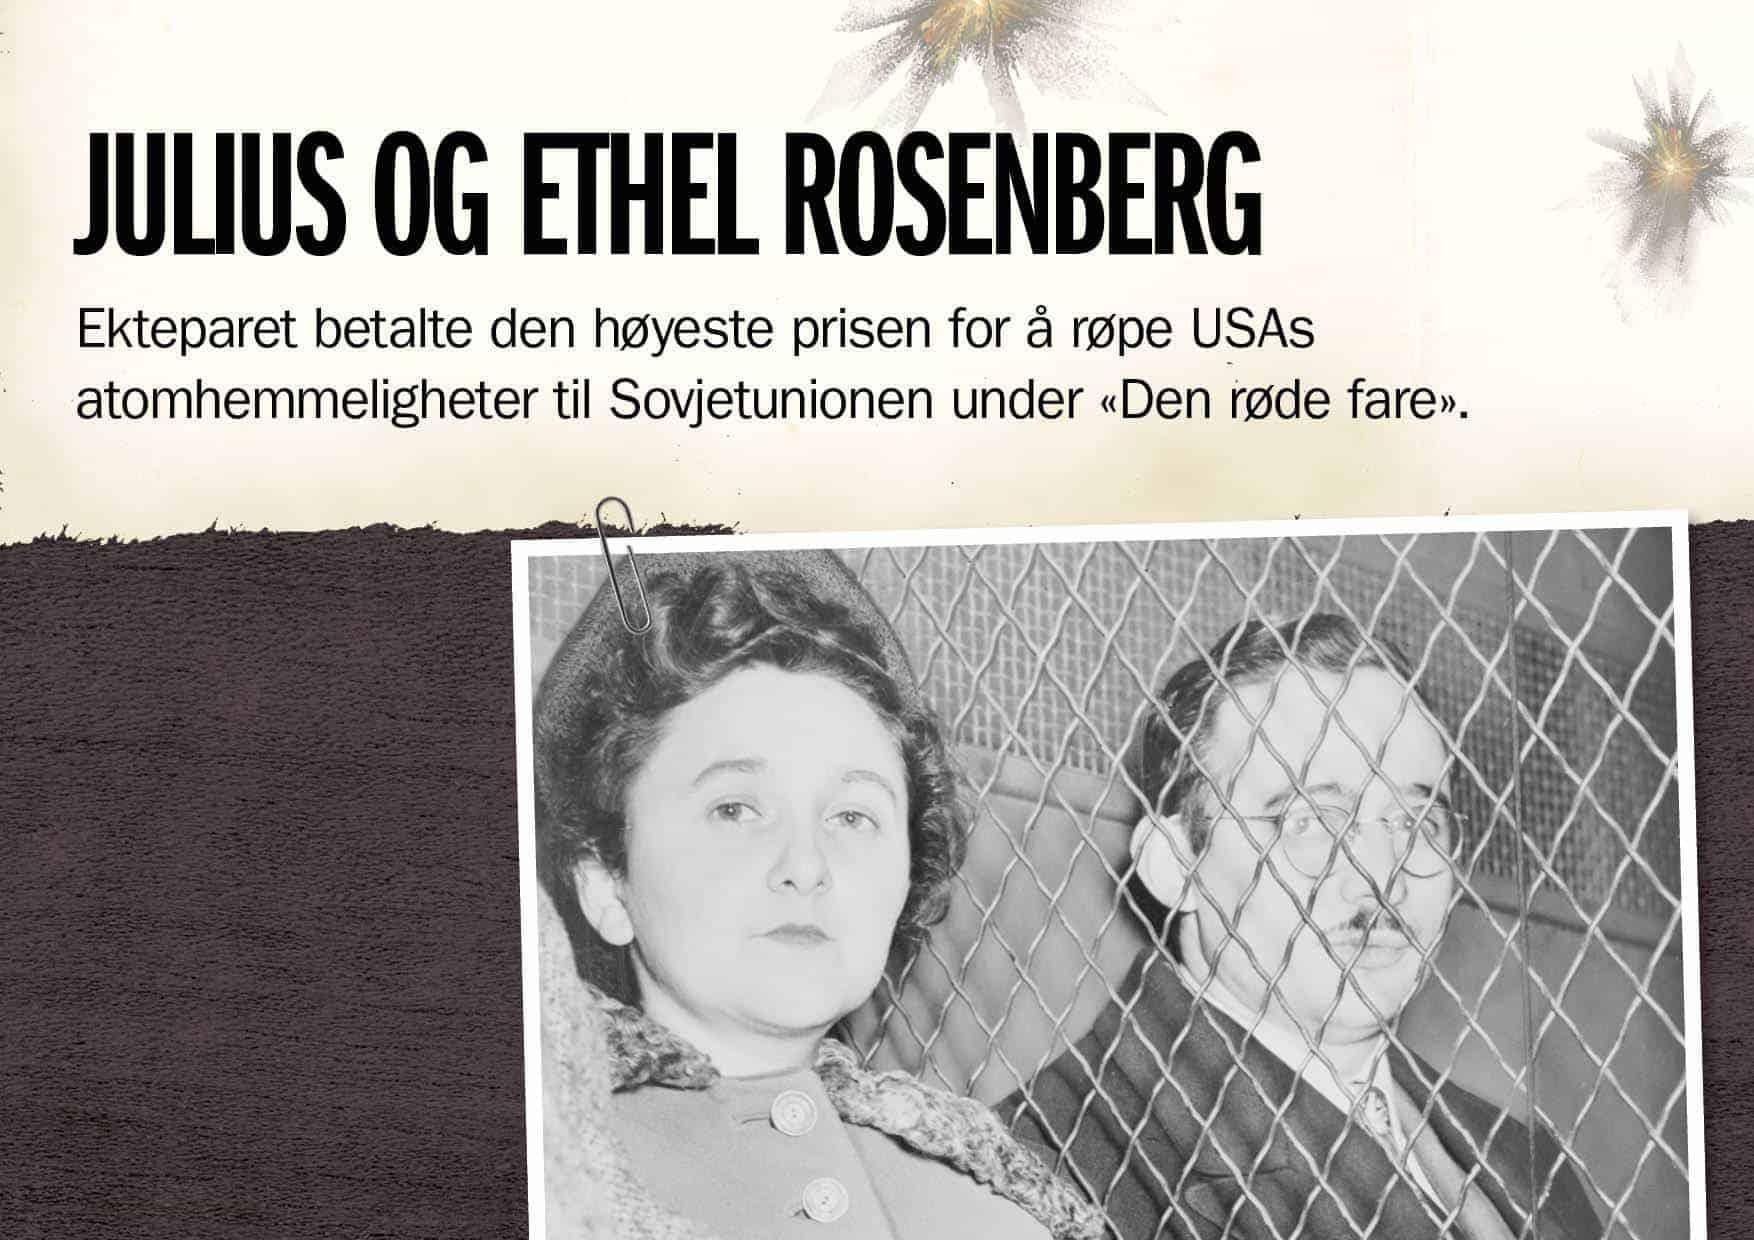 Superspioner: Julius og Ethel Rosenberg